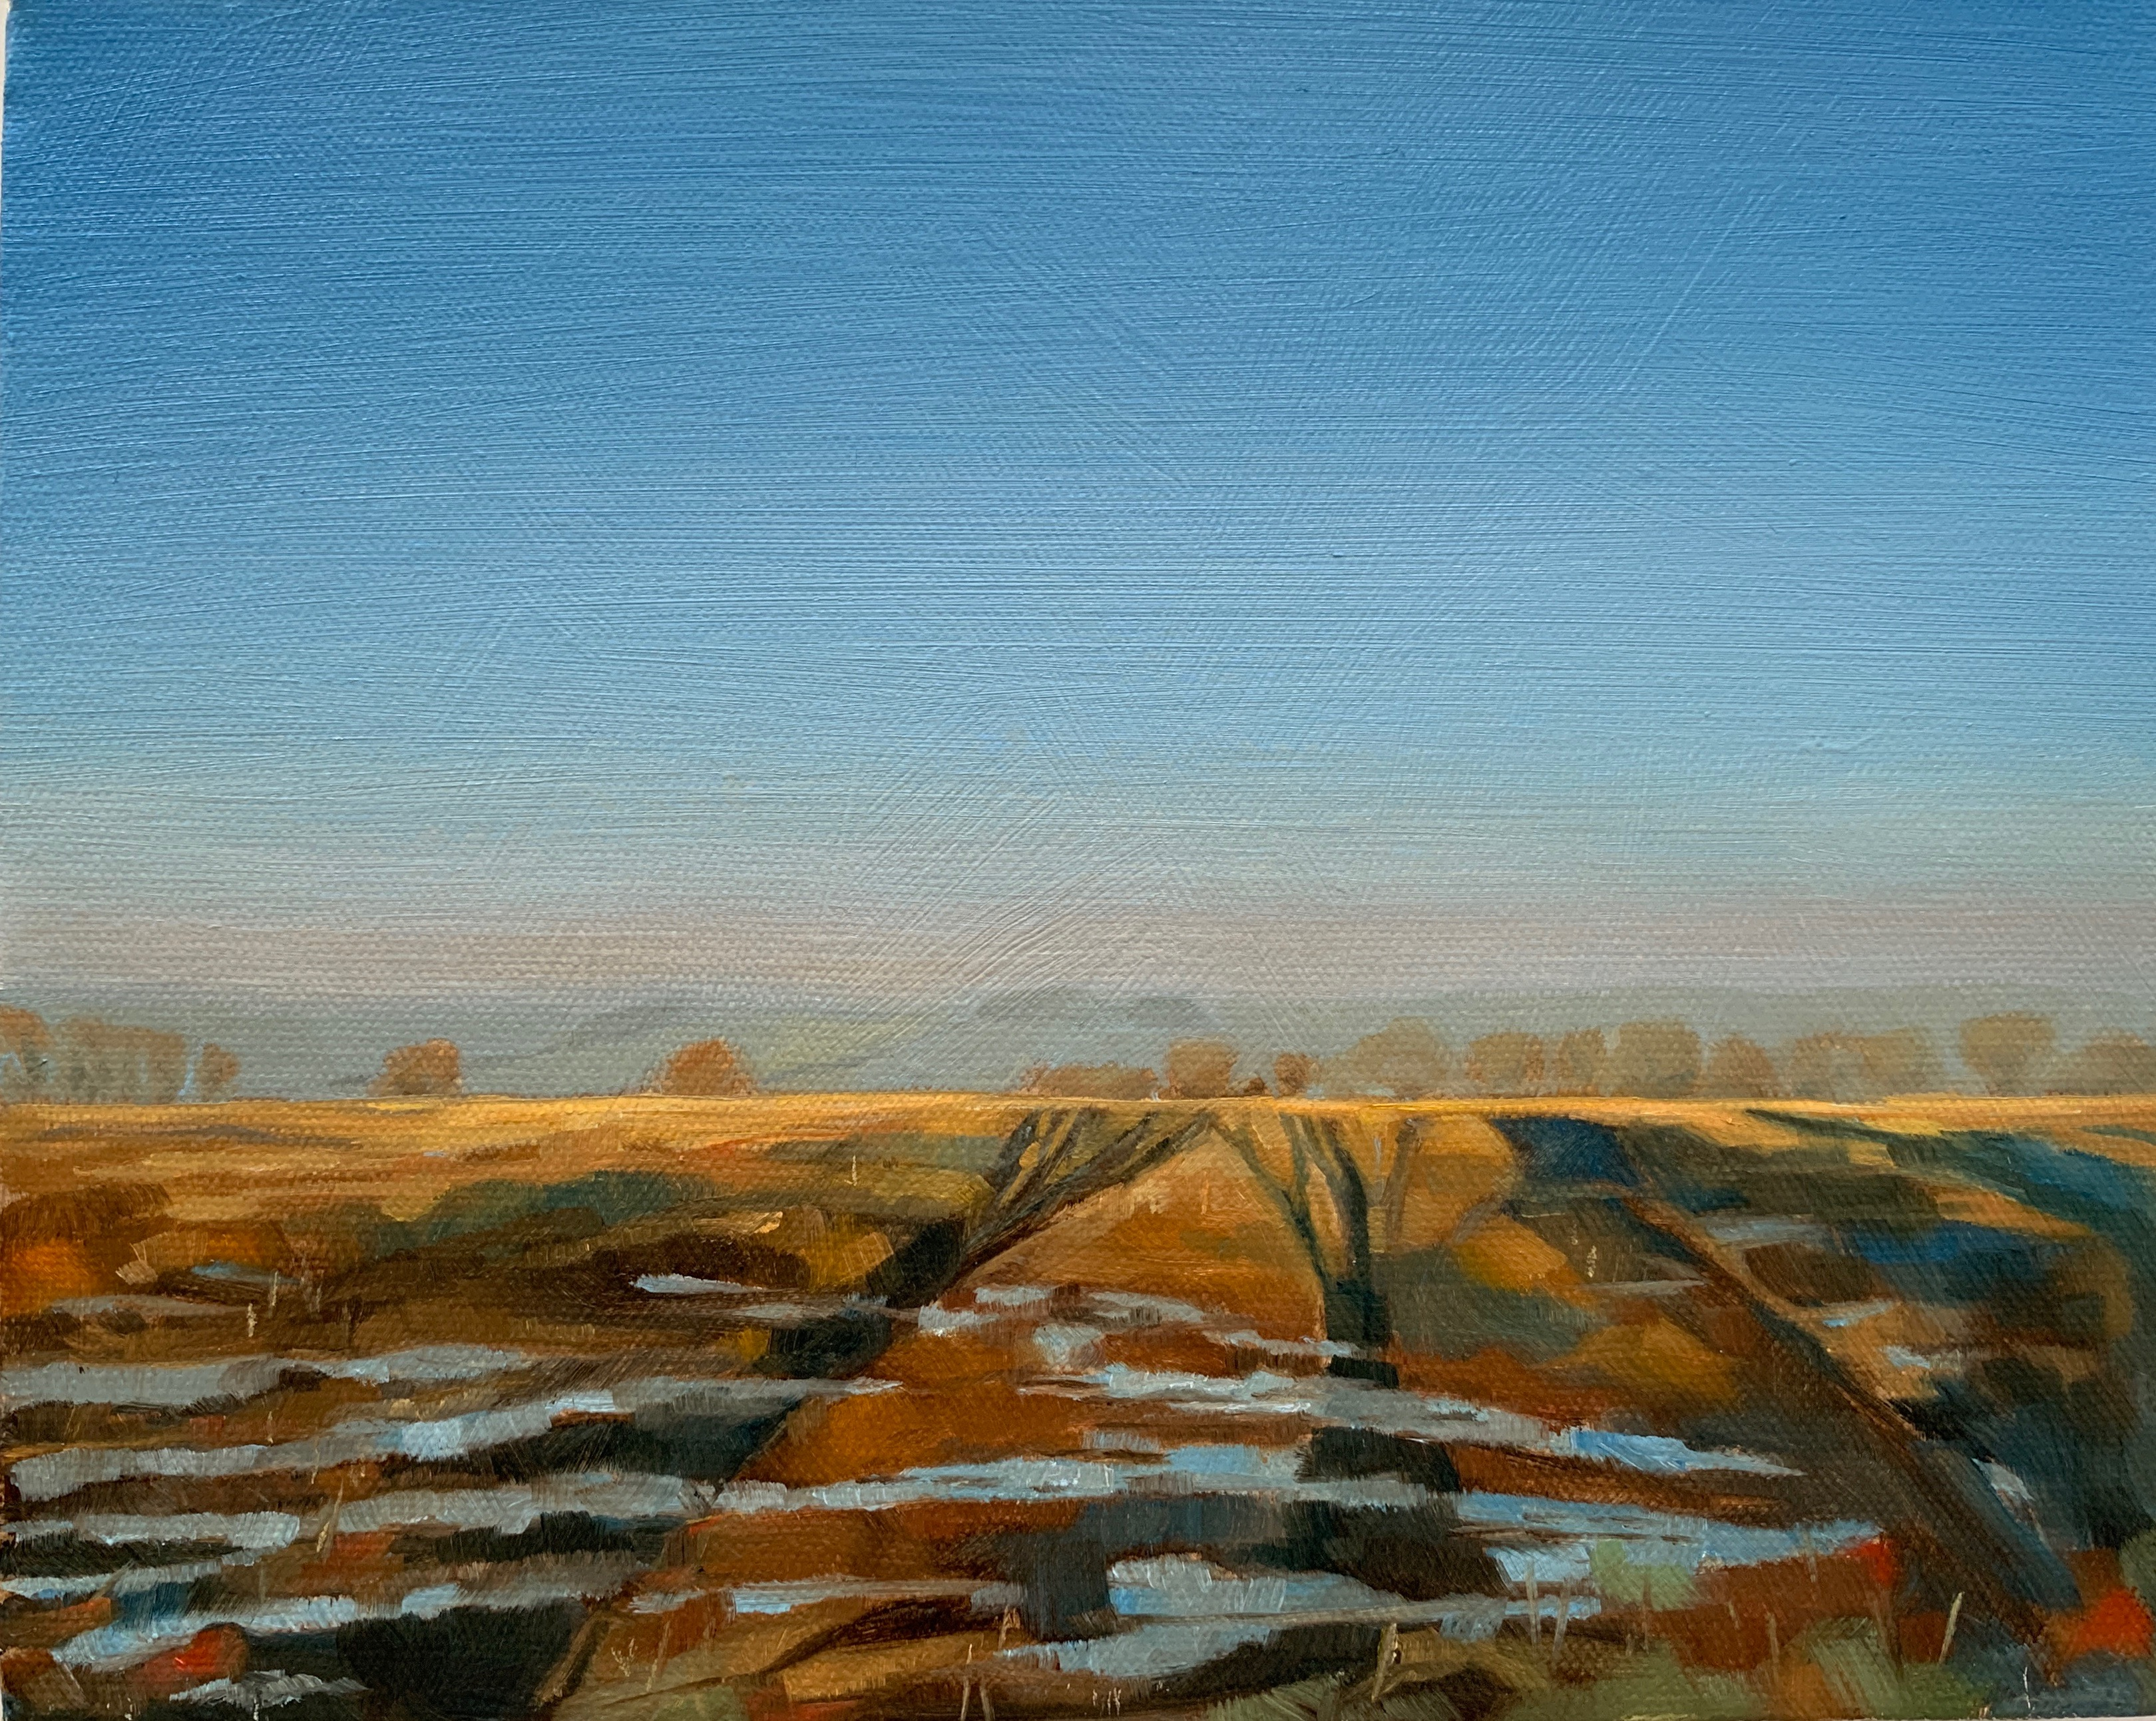 Winter Shadows, Oil on canvas 8 x 6 Alex